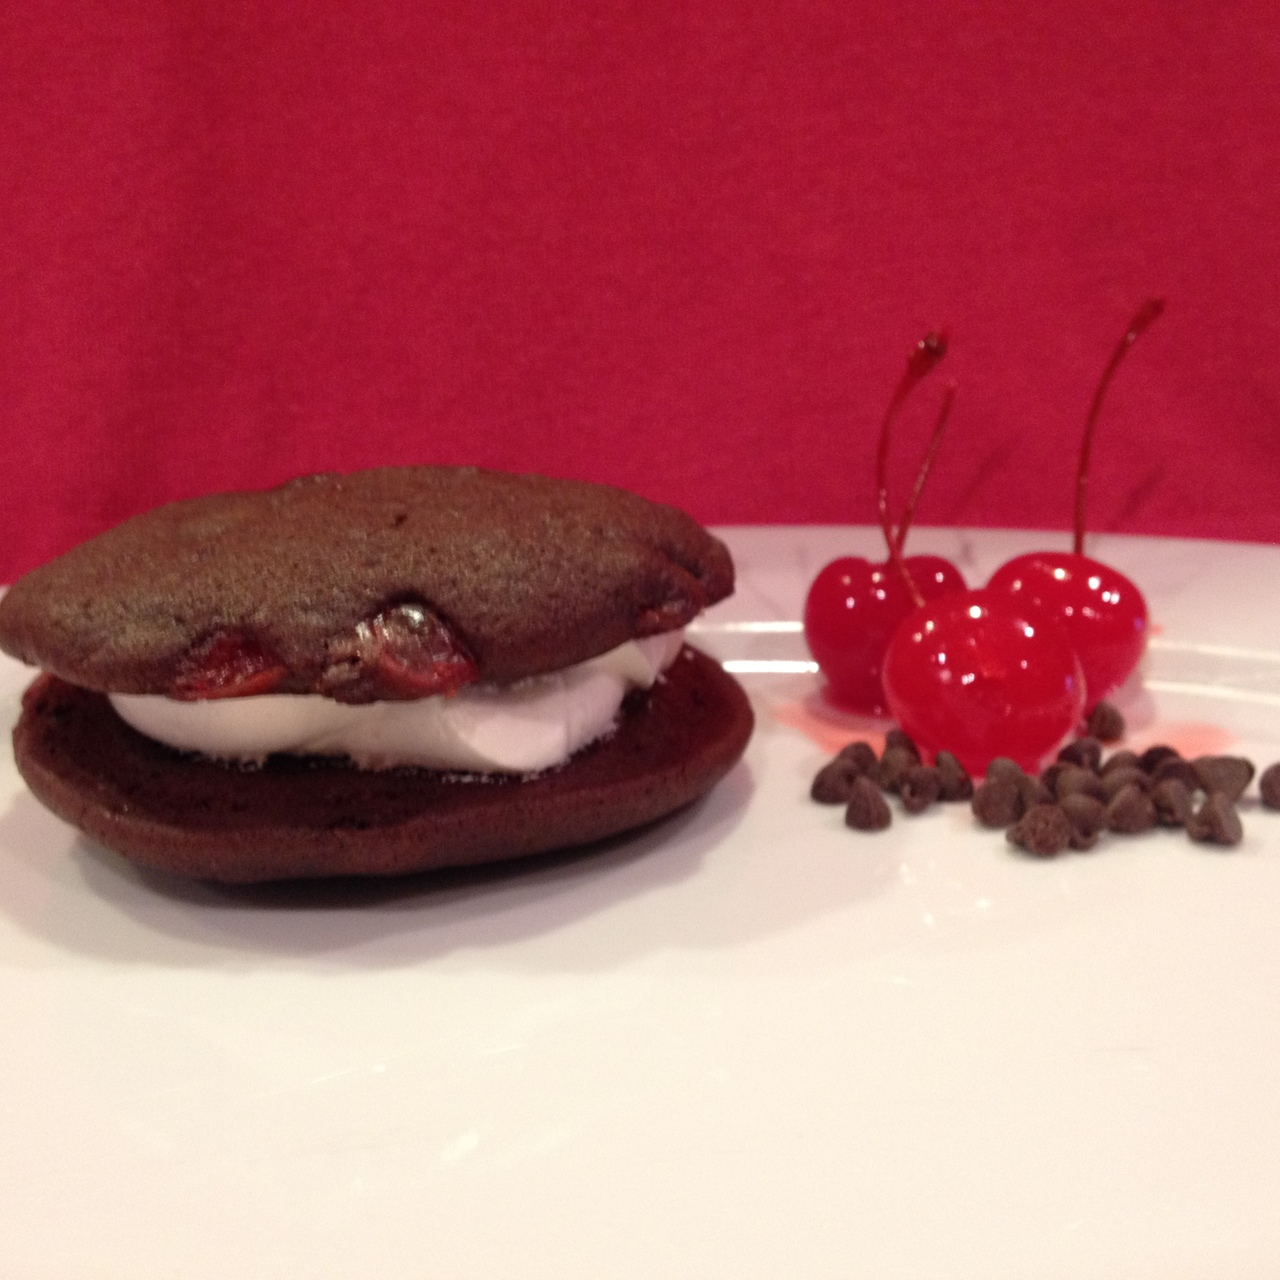 12 Pack- Large Chocolate Cherry Whoopie Pies